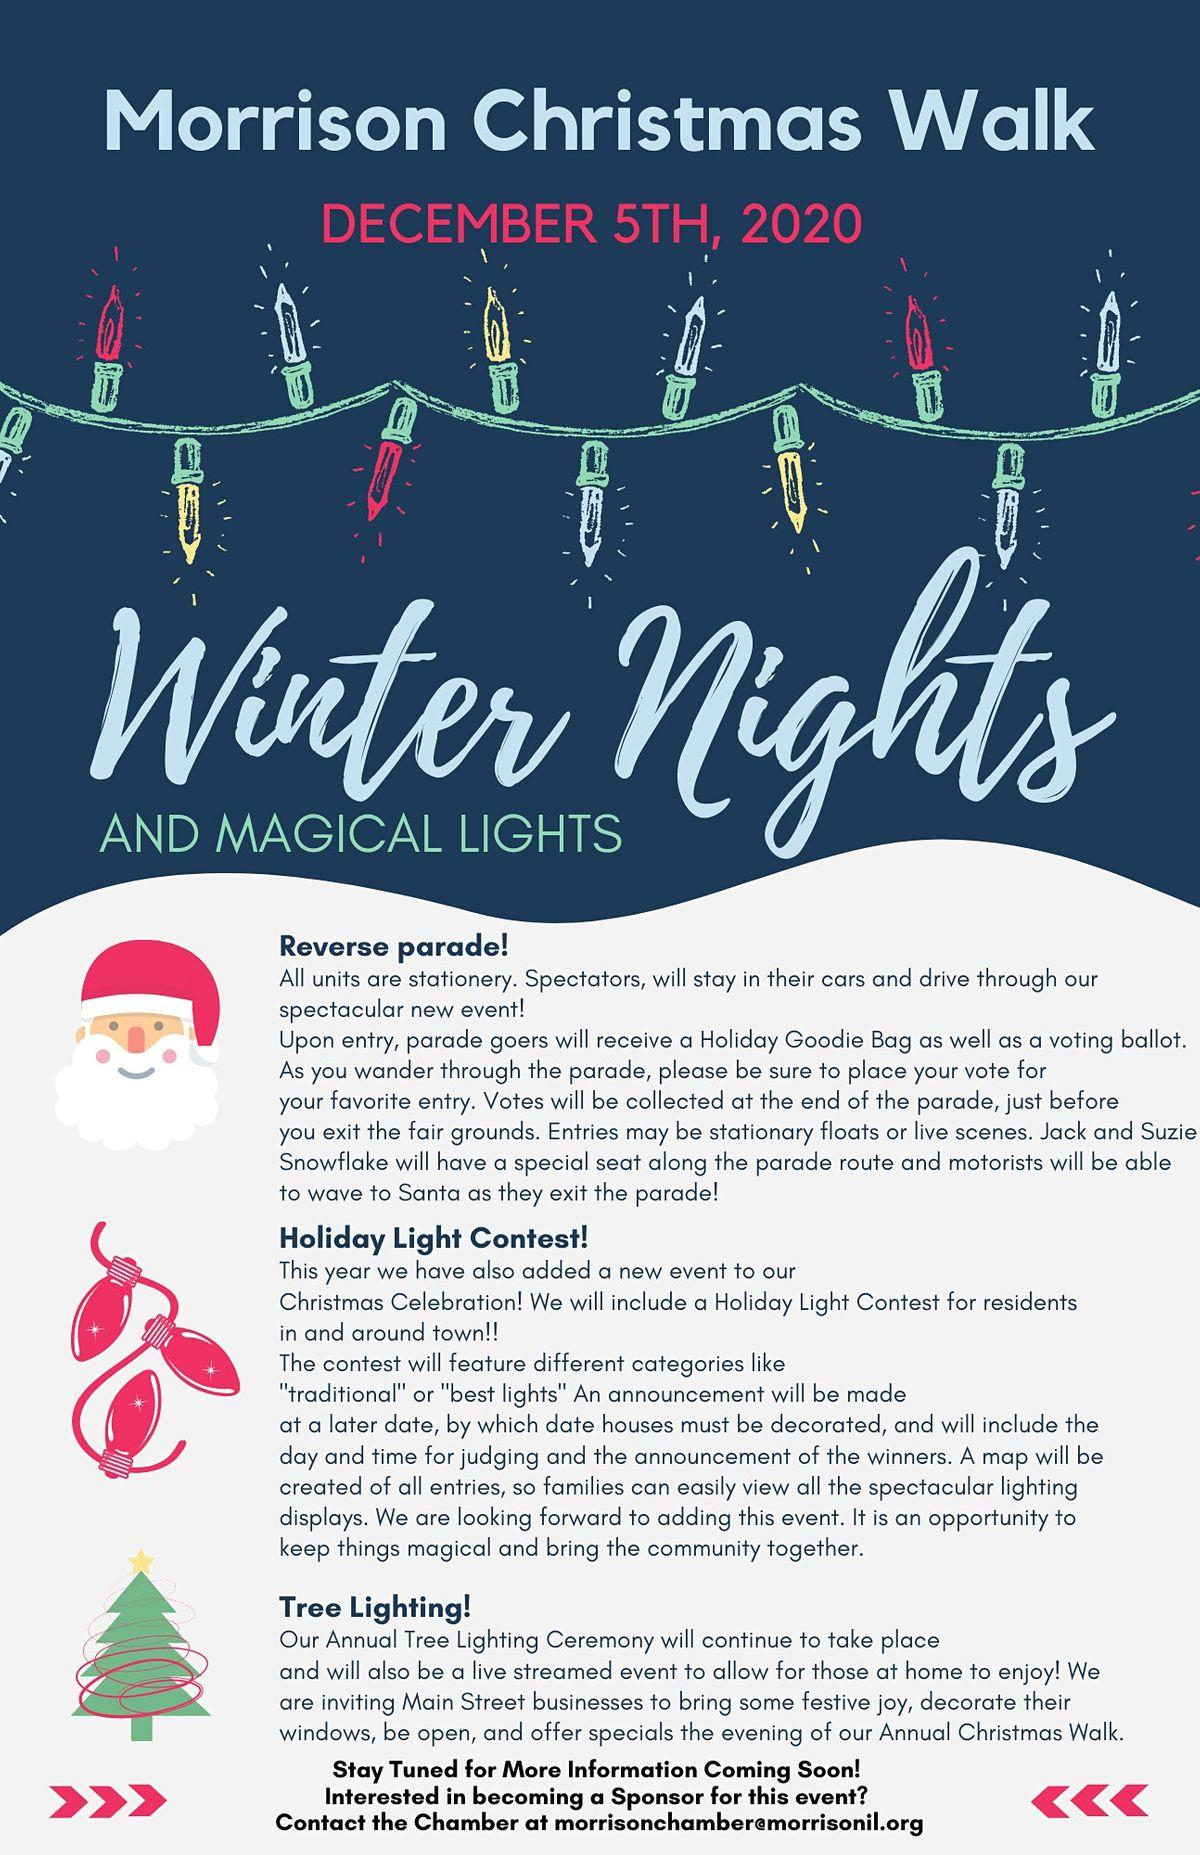 Peoria Il Christmas House Walk 2020 2020 Morrison Christmas Walk   Winter Nights and Magical Lights